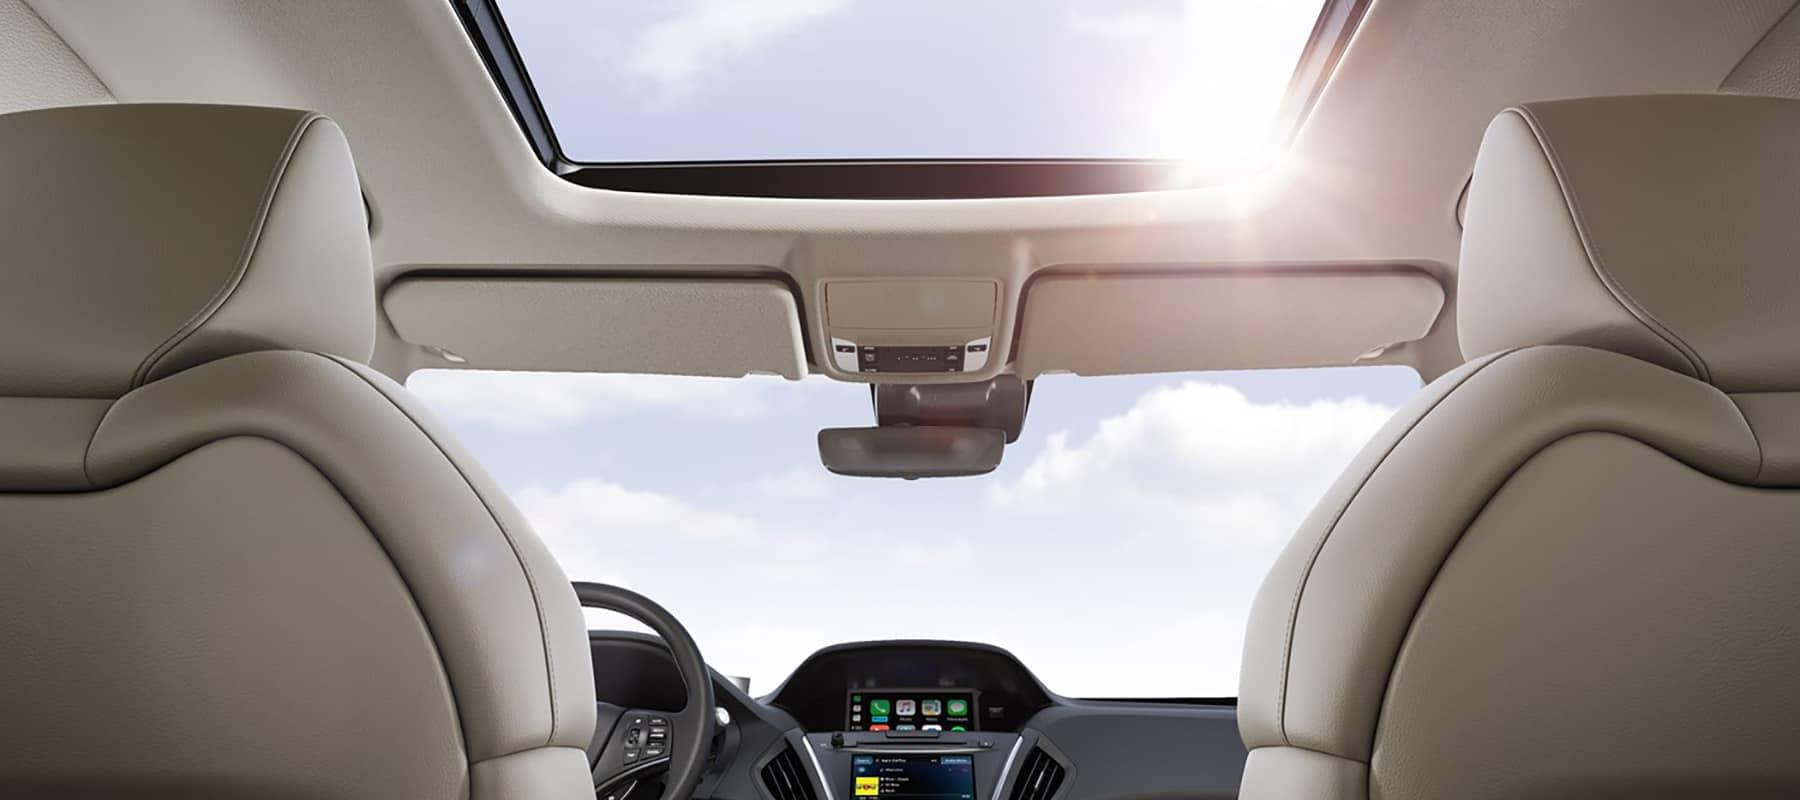 2019 Acura MDX Sunroof